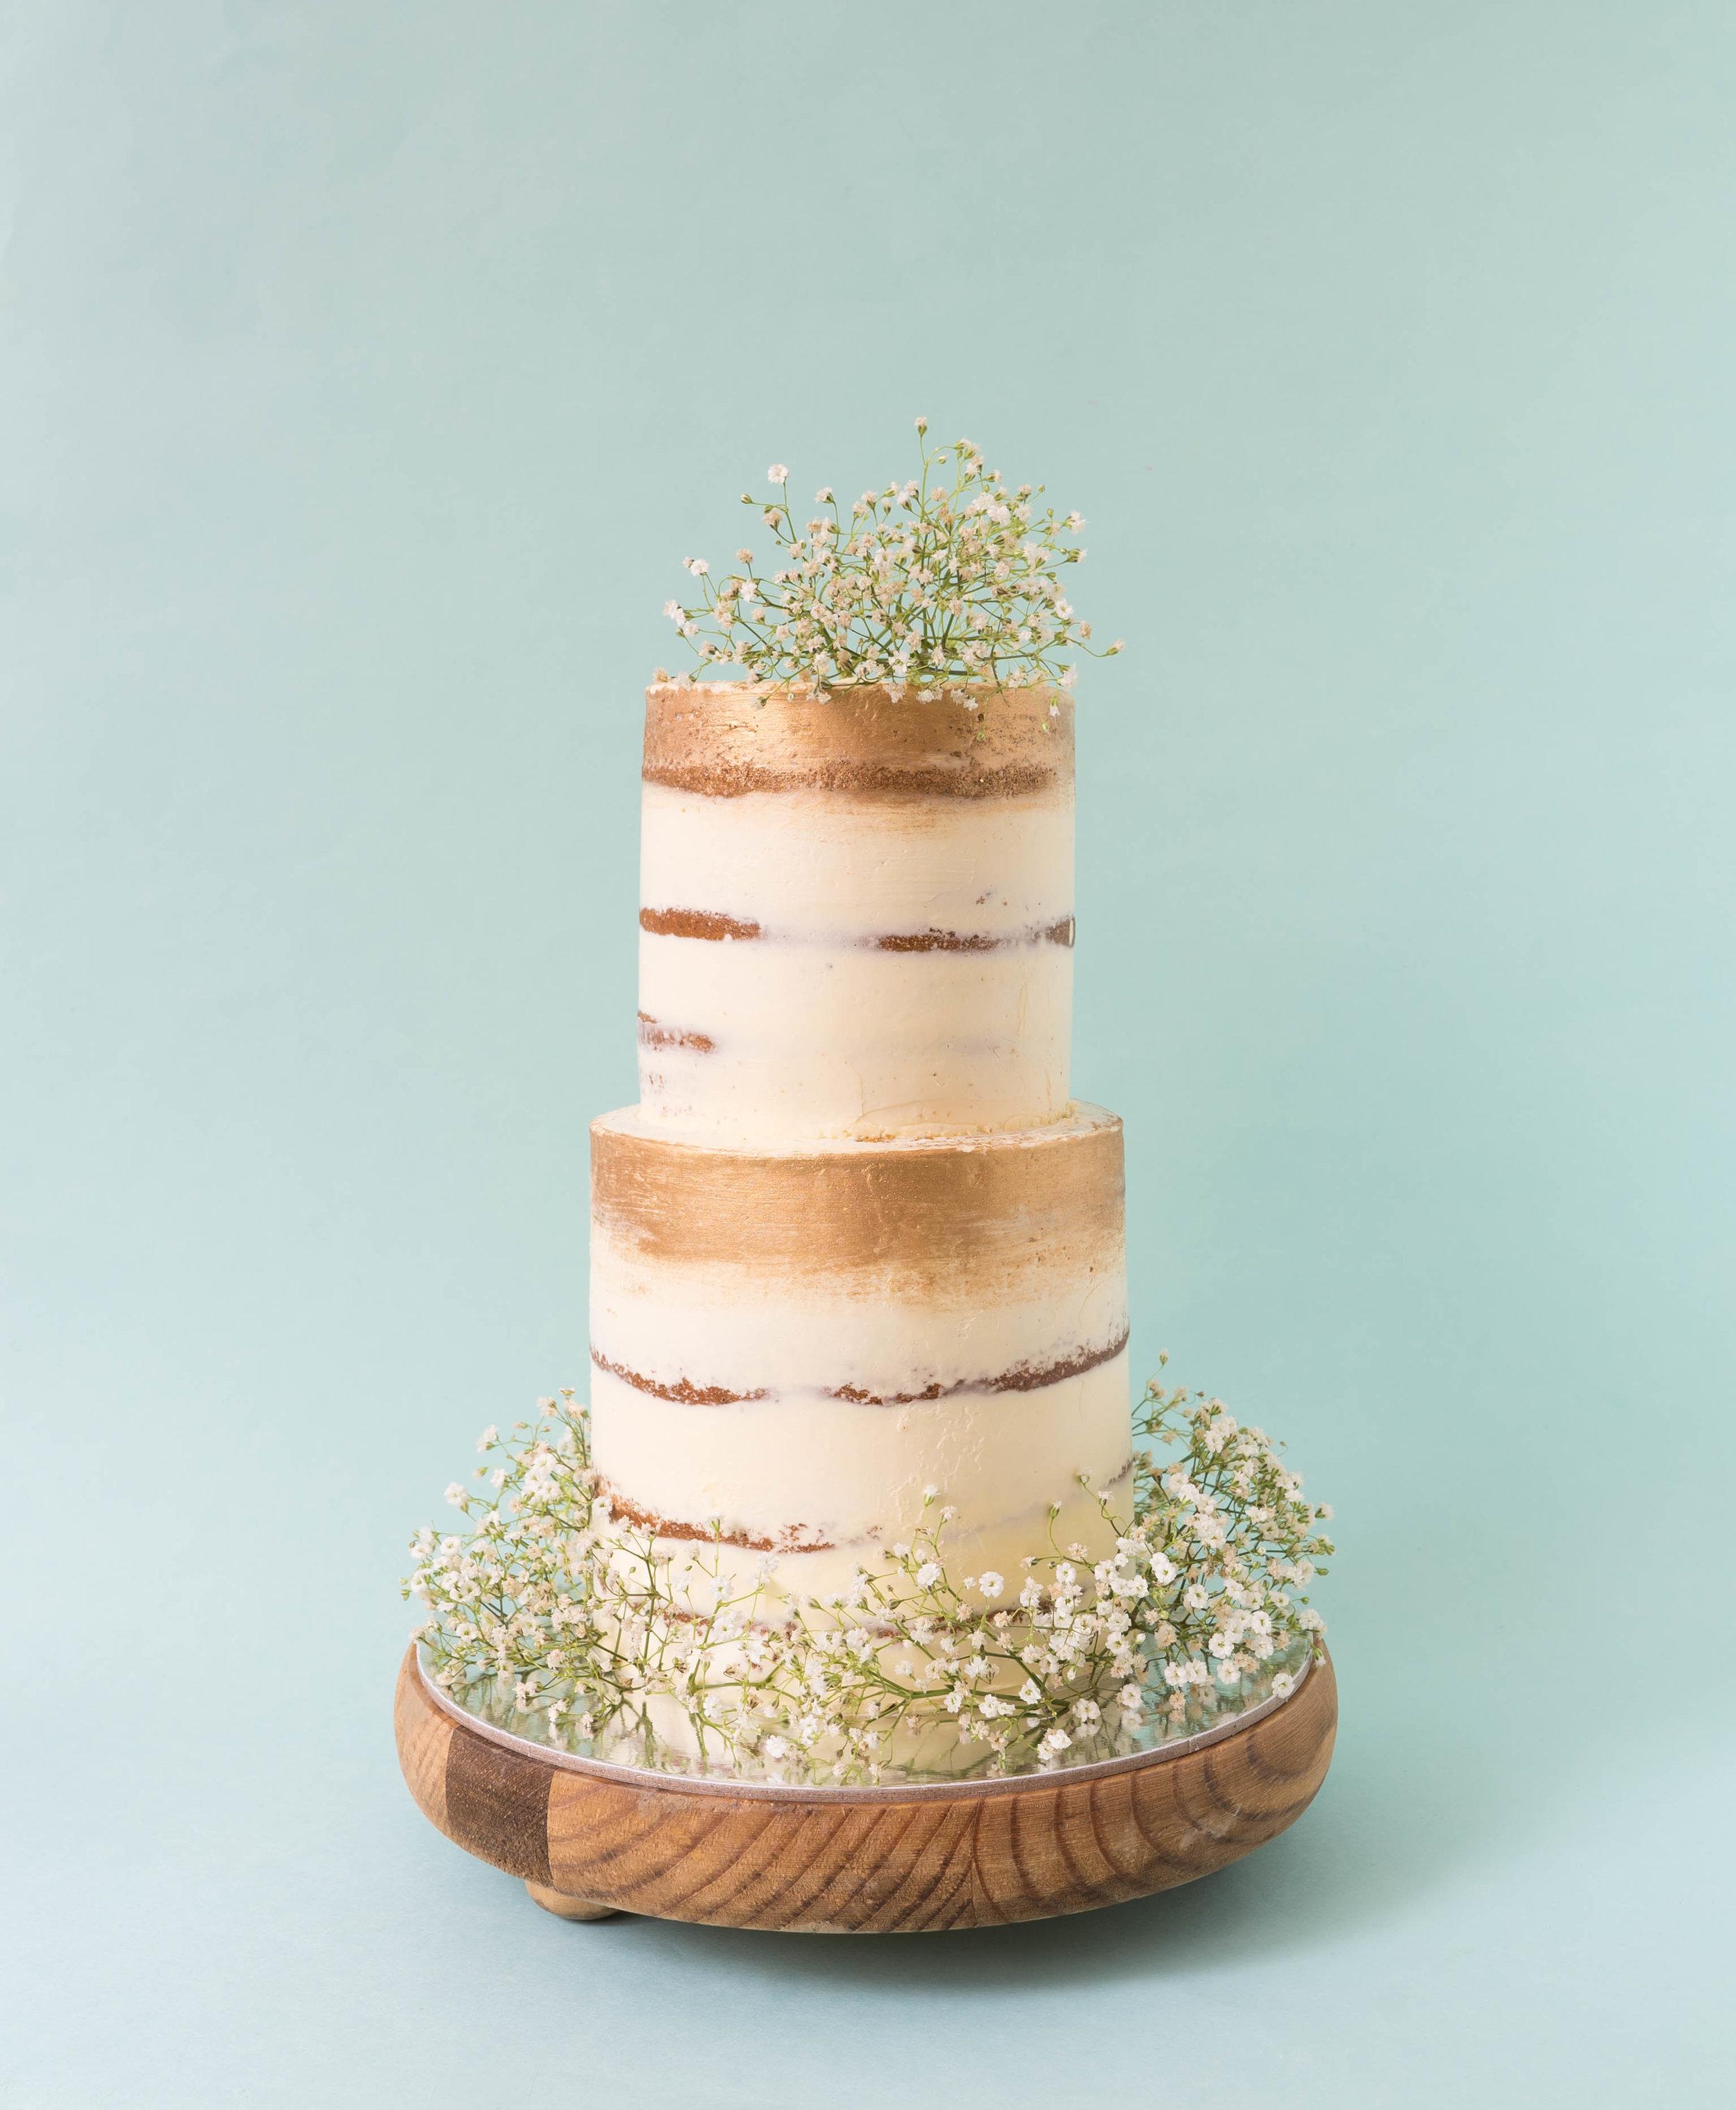 Chloe Babysbreath Cake.jpg